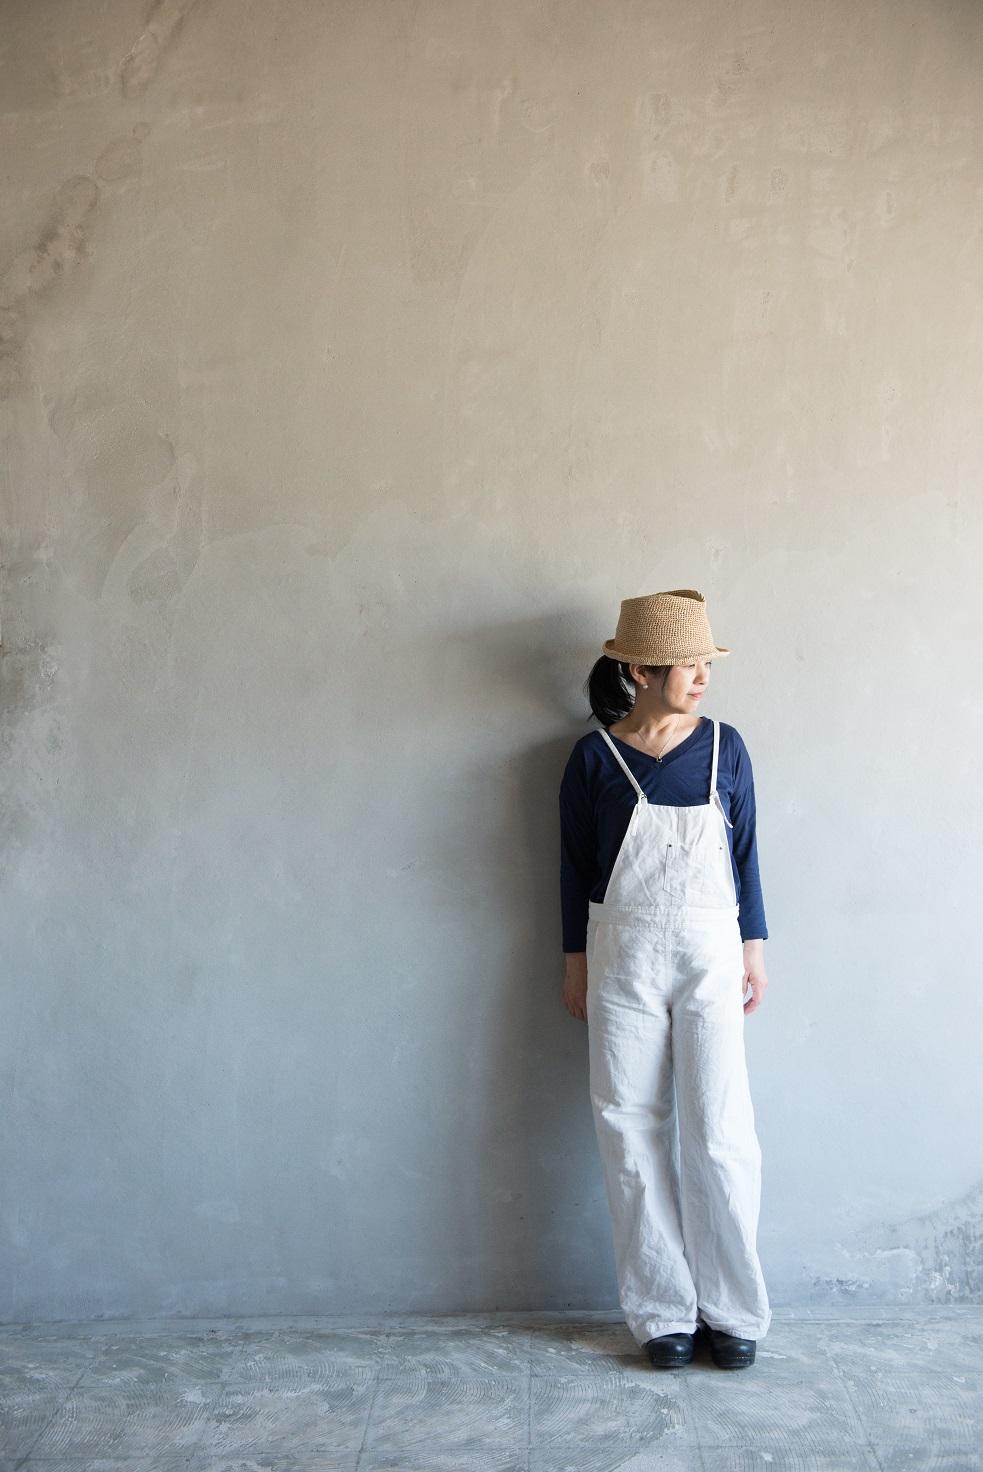 COMFORT  糸からはじまるゆたかな日常展  遠鉄百貨店/静岡浜松